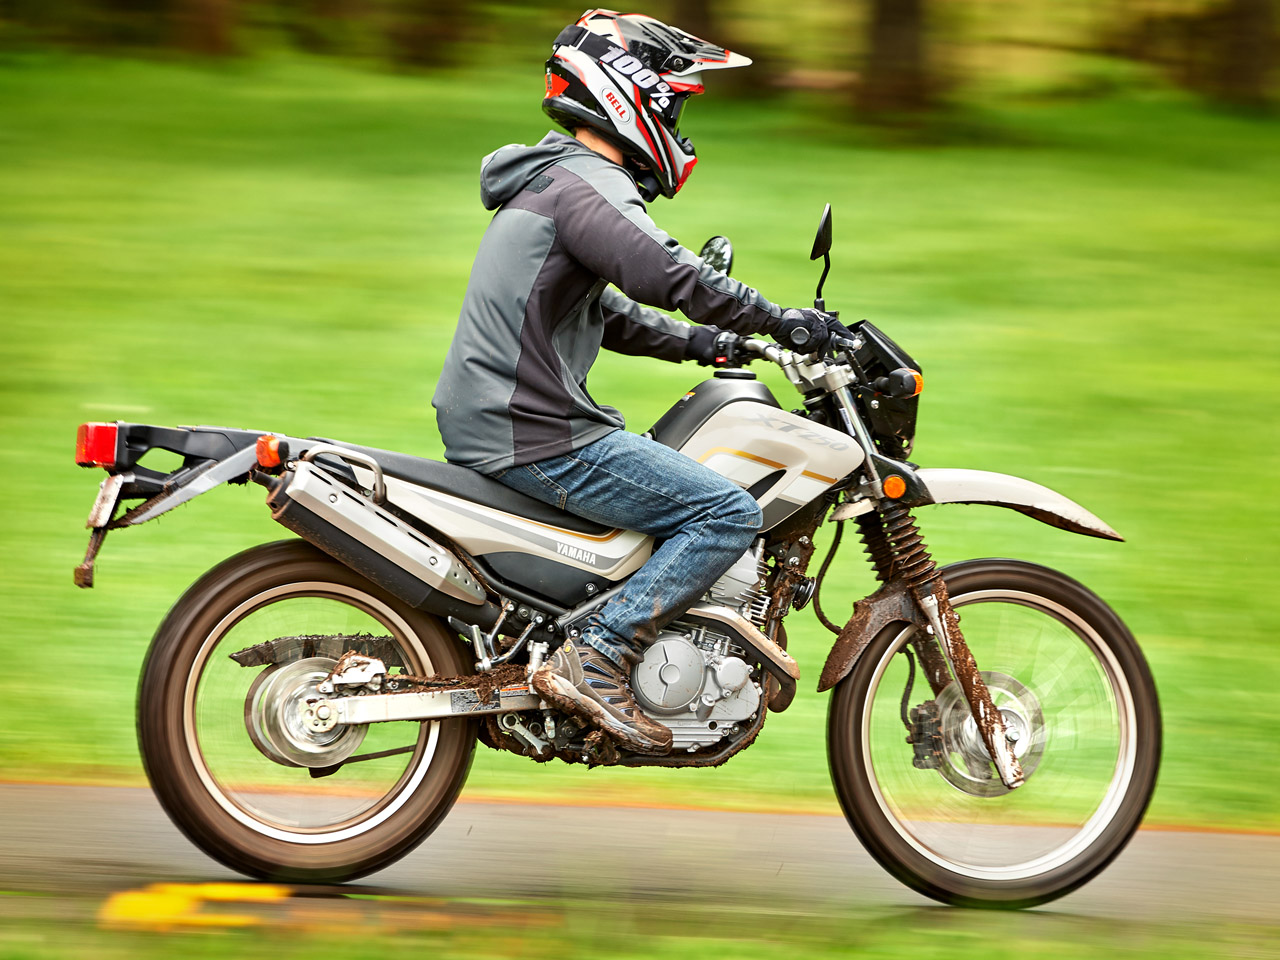 Yamaha XT250 motorcycle riding on dirt track